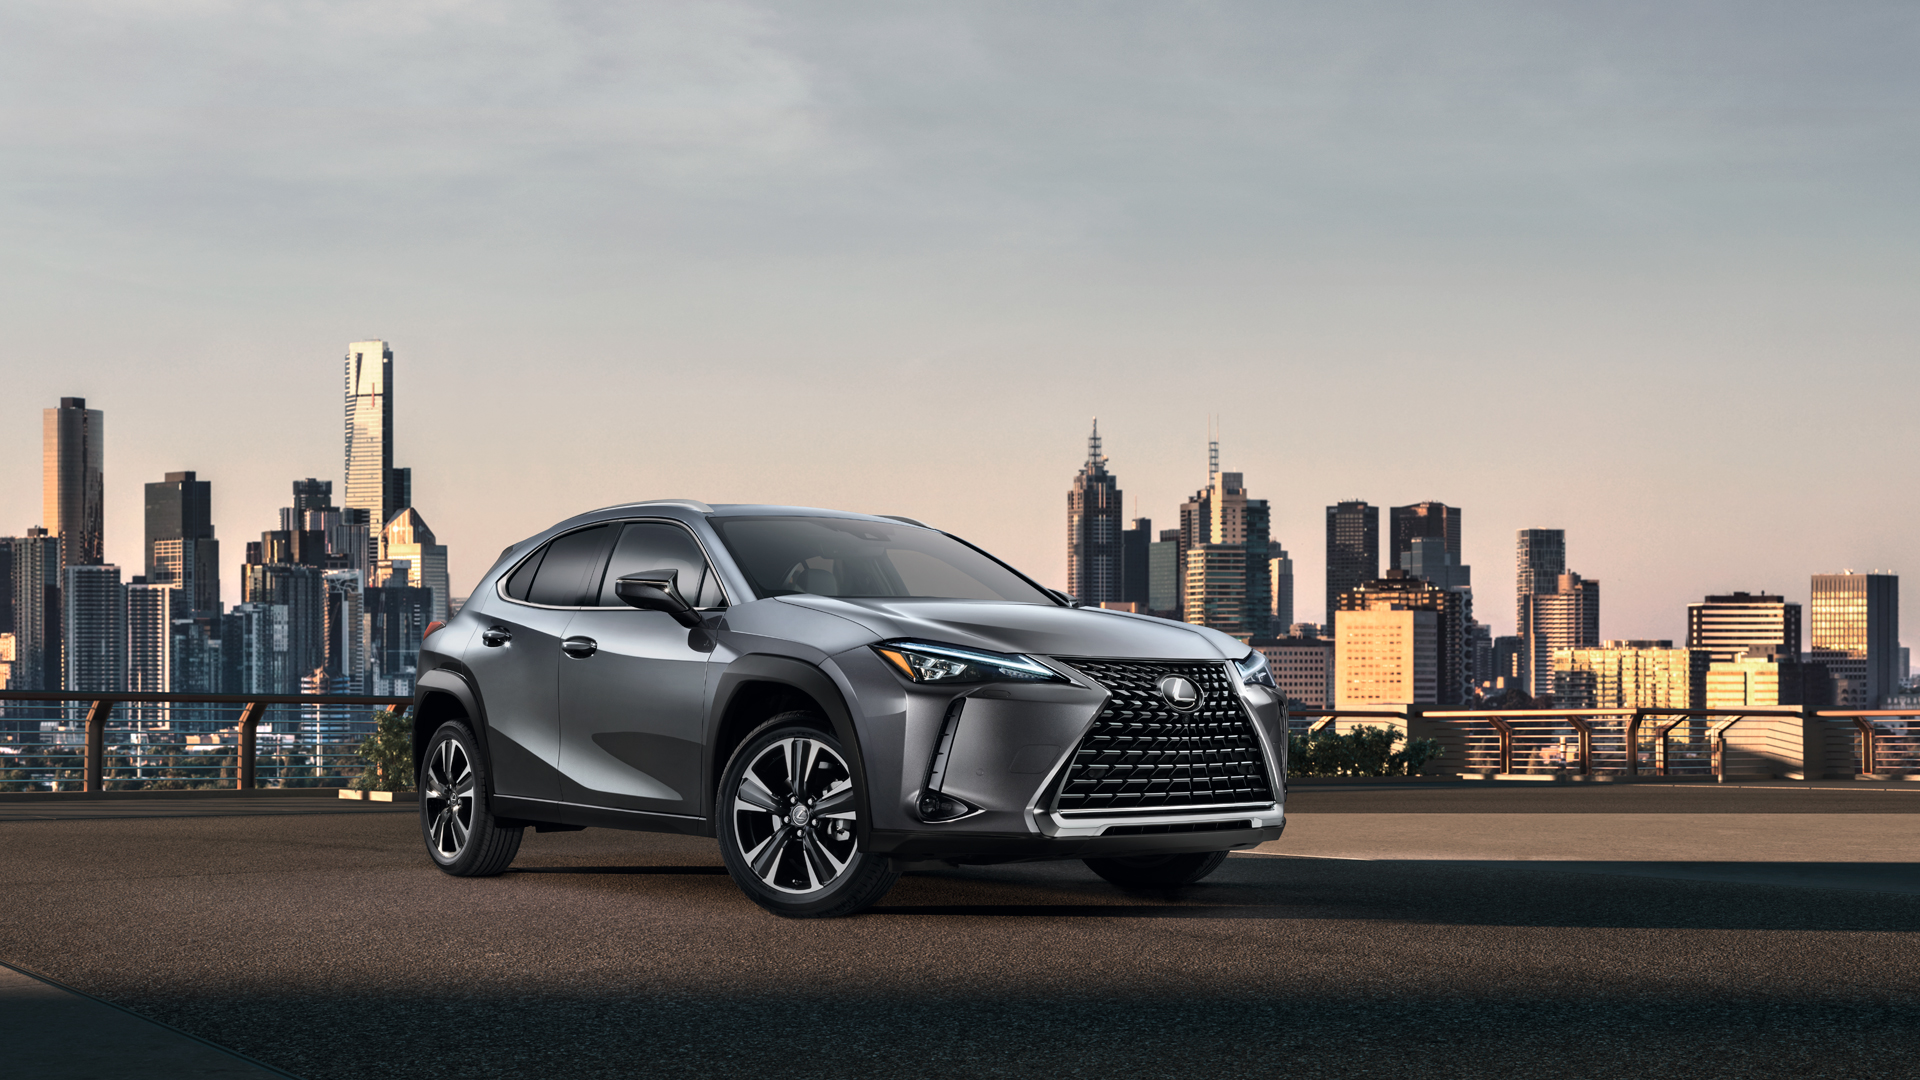 Presentación mundial del Lexus UX hero asset